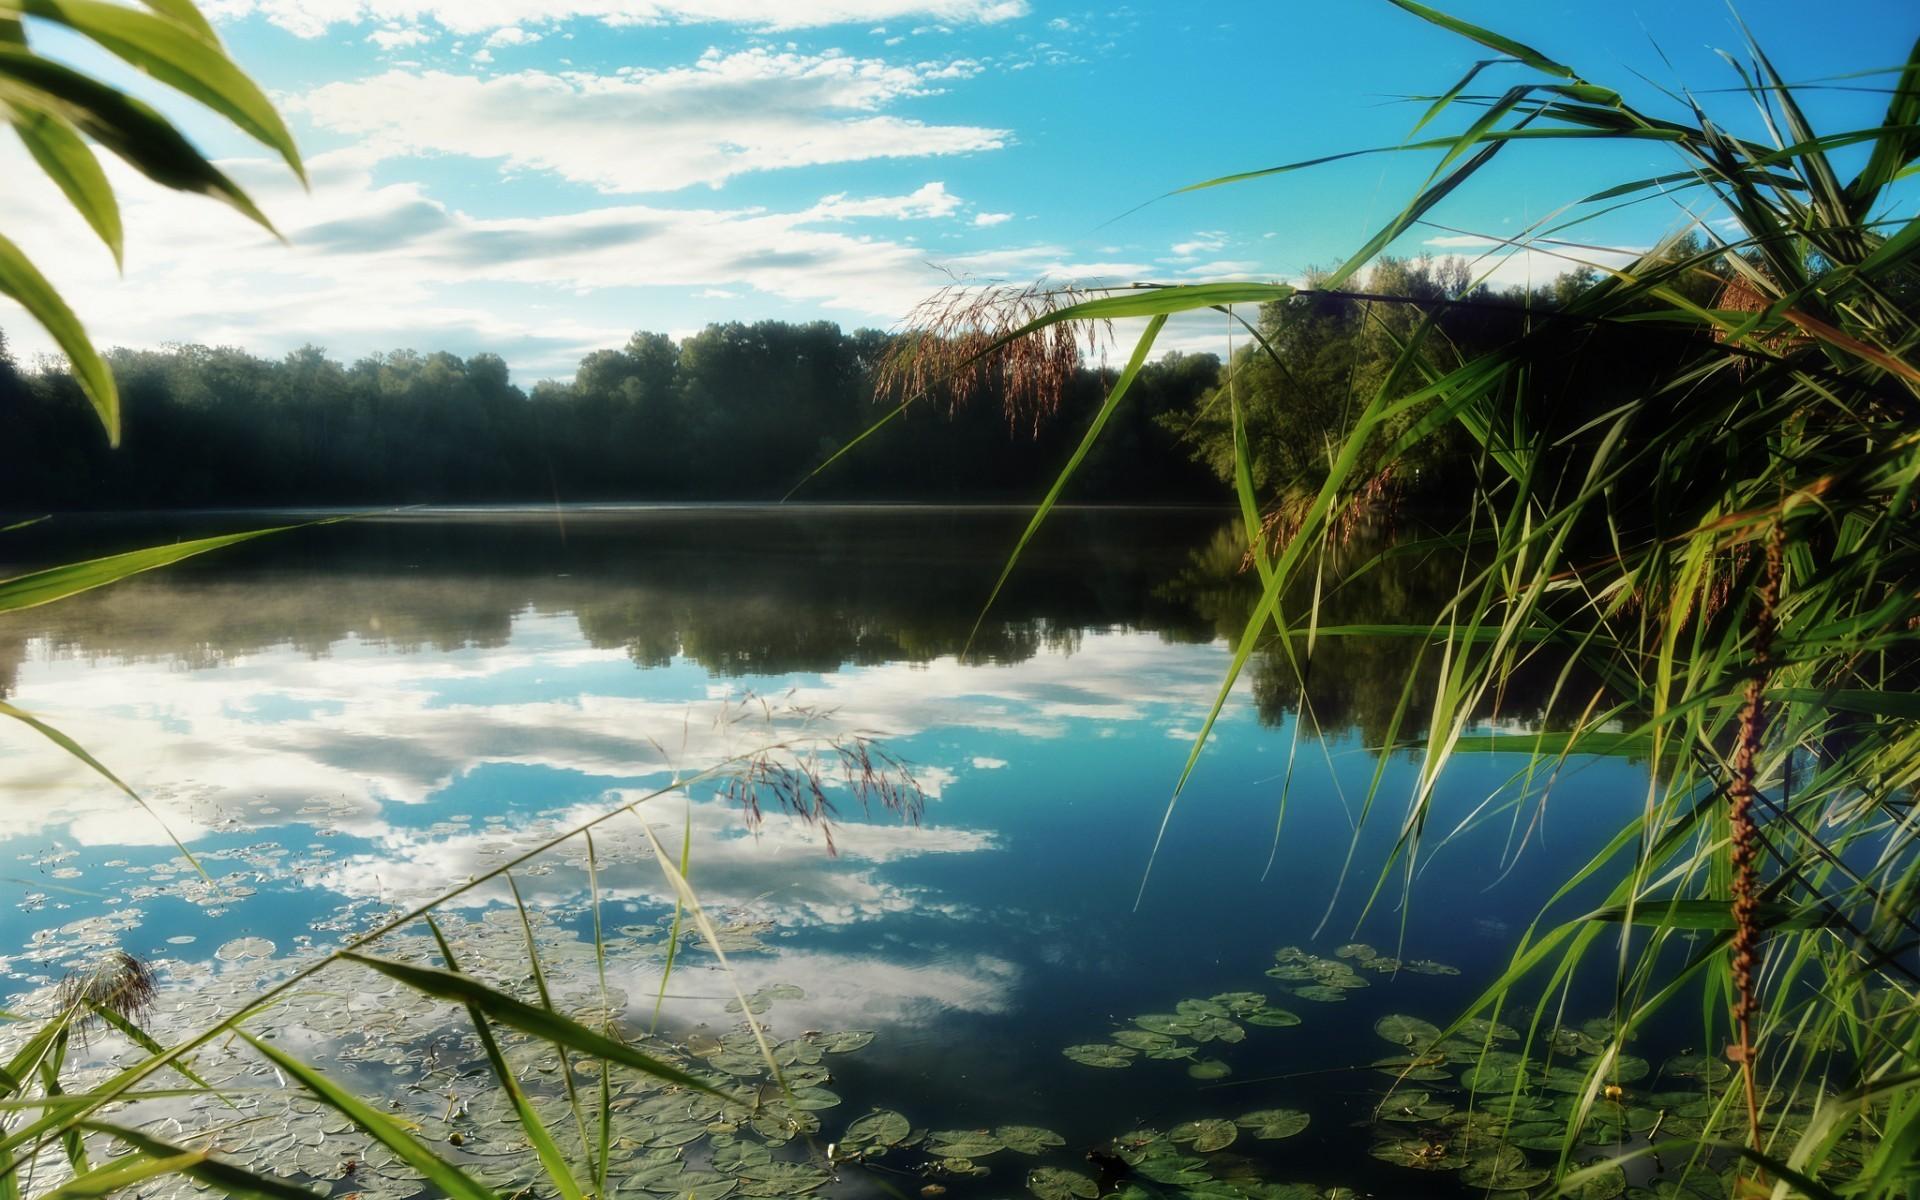 General 1920x1200 lake nature landscape water sky